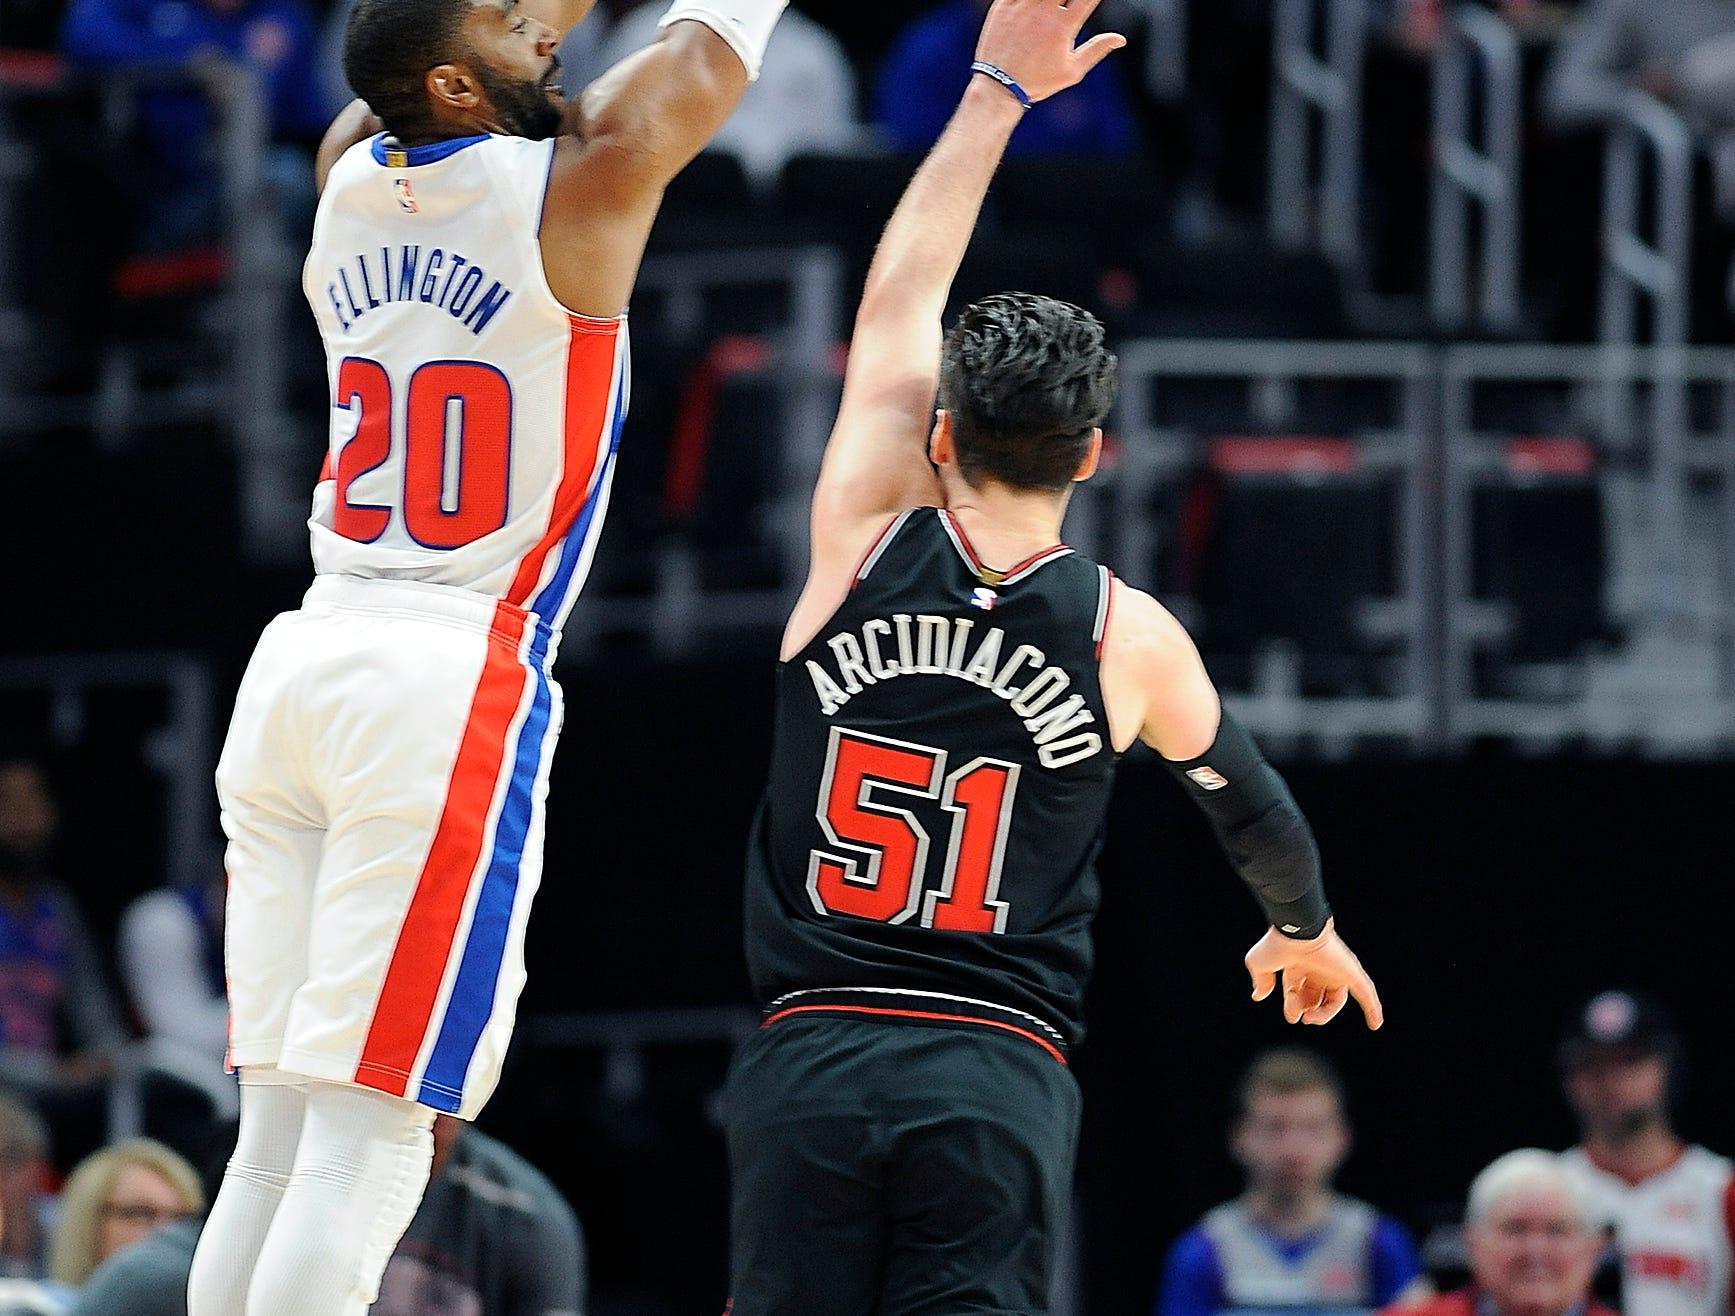 Pistons' Wayne Ellington scores over Bulls' Ryan Arcidiacono in the first quarter.